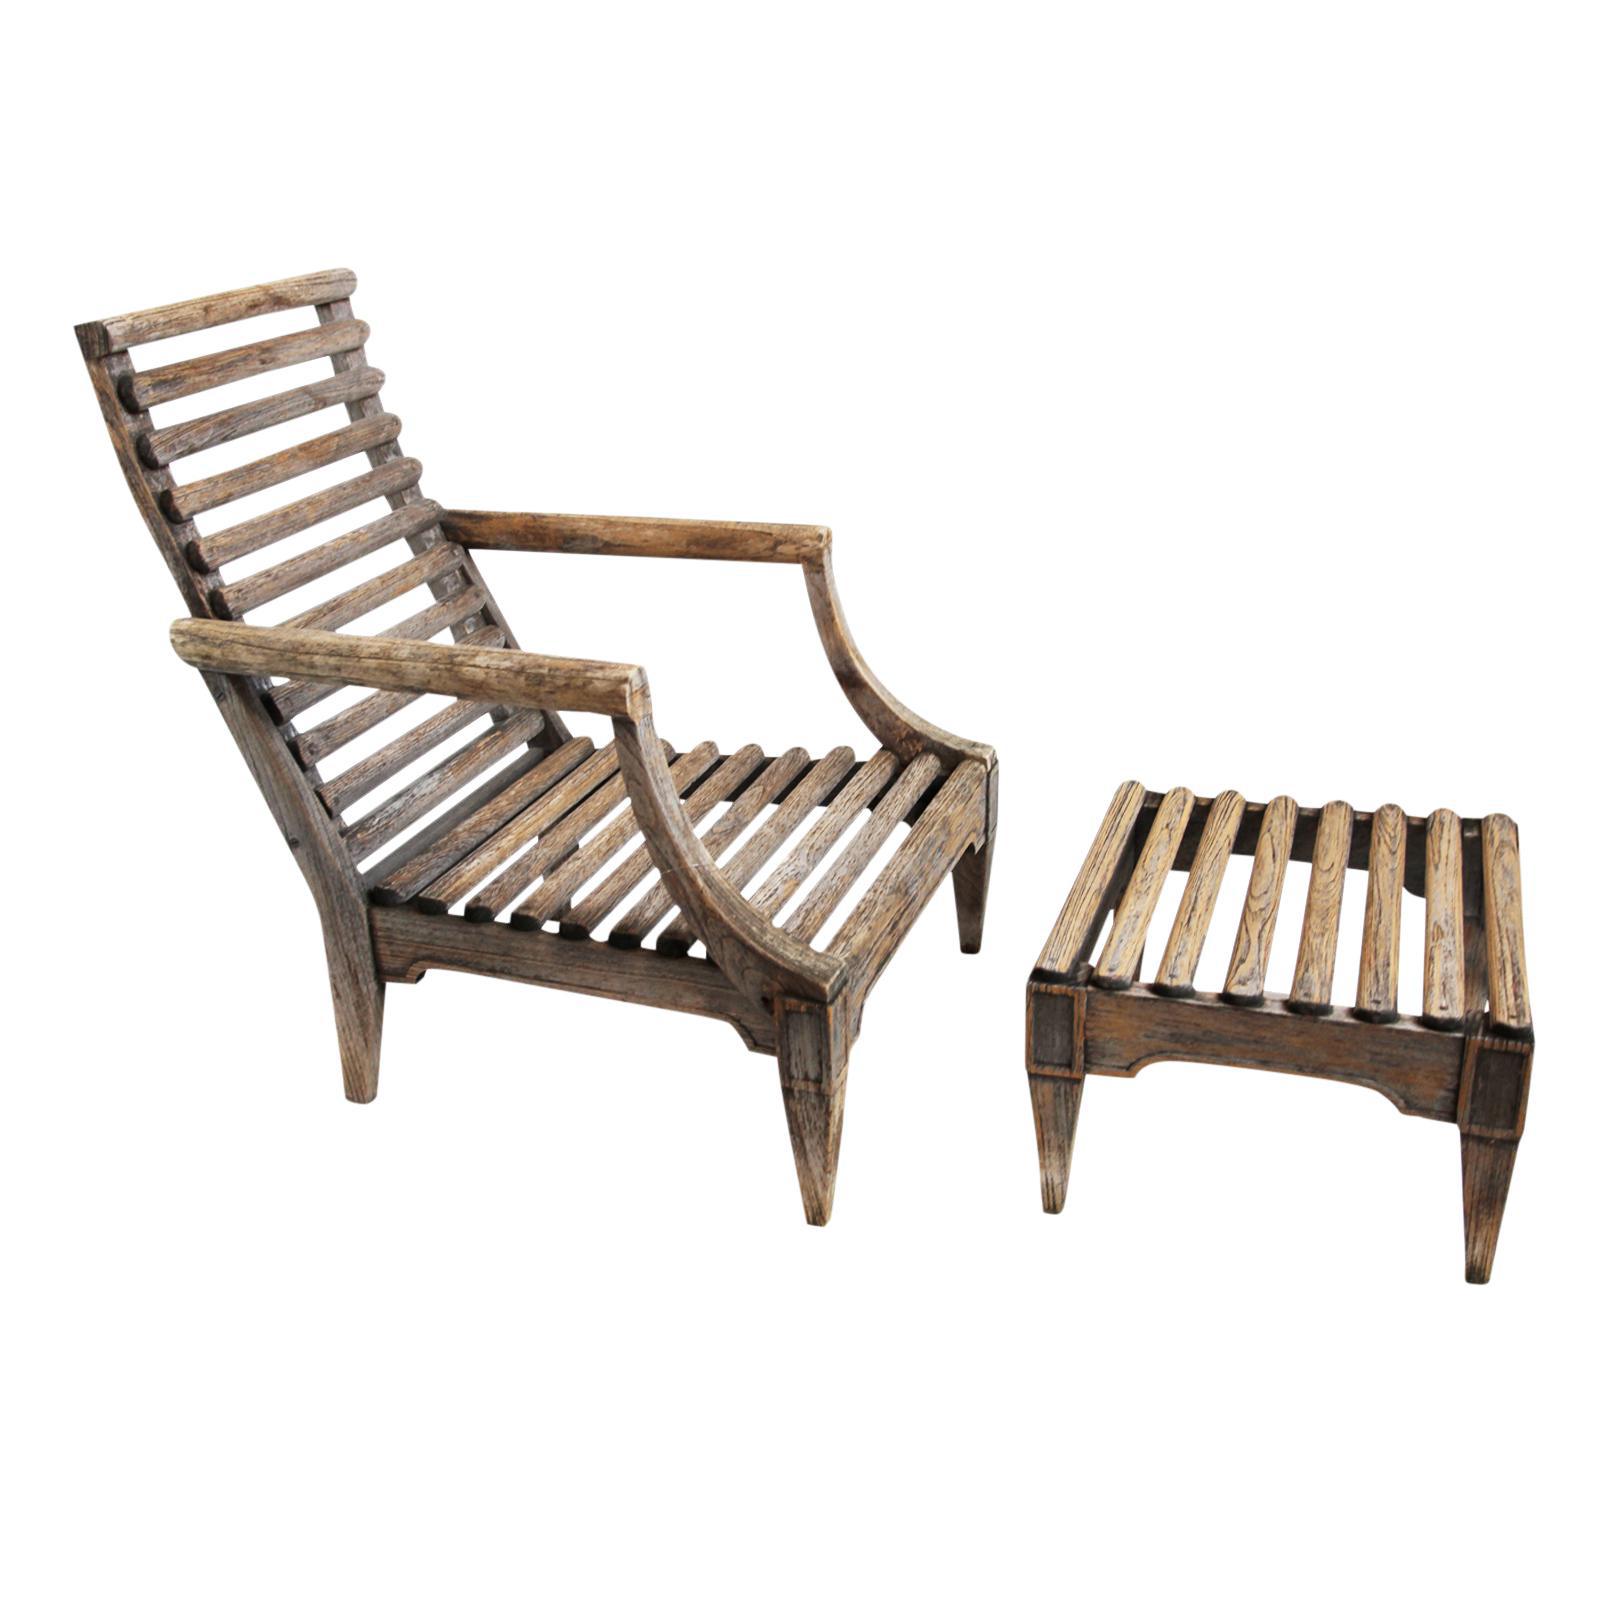 Outdoor Teak Slat Arm Chair With Ottoman